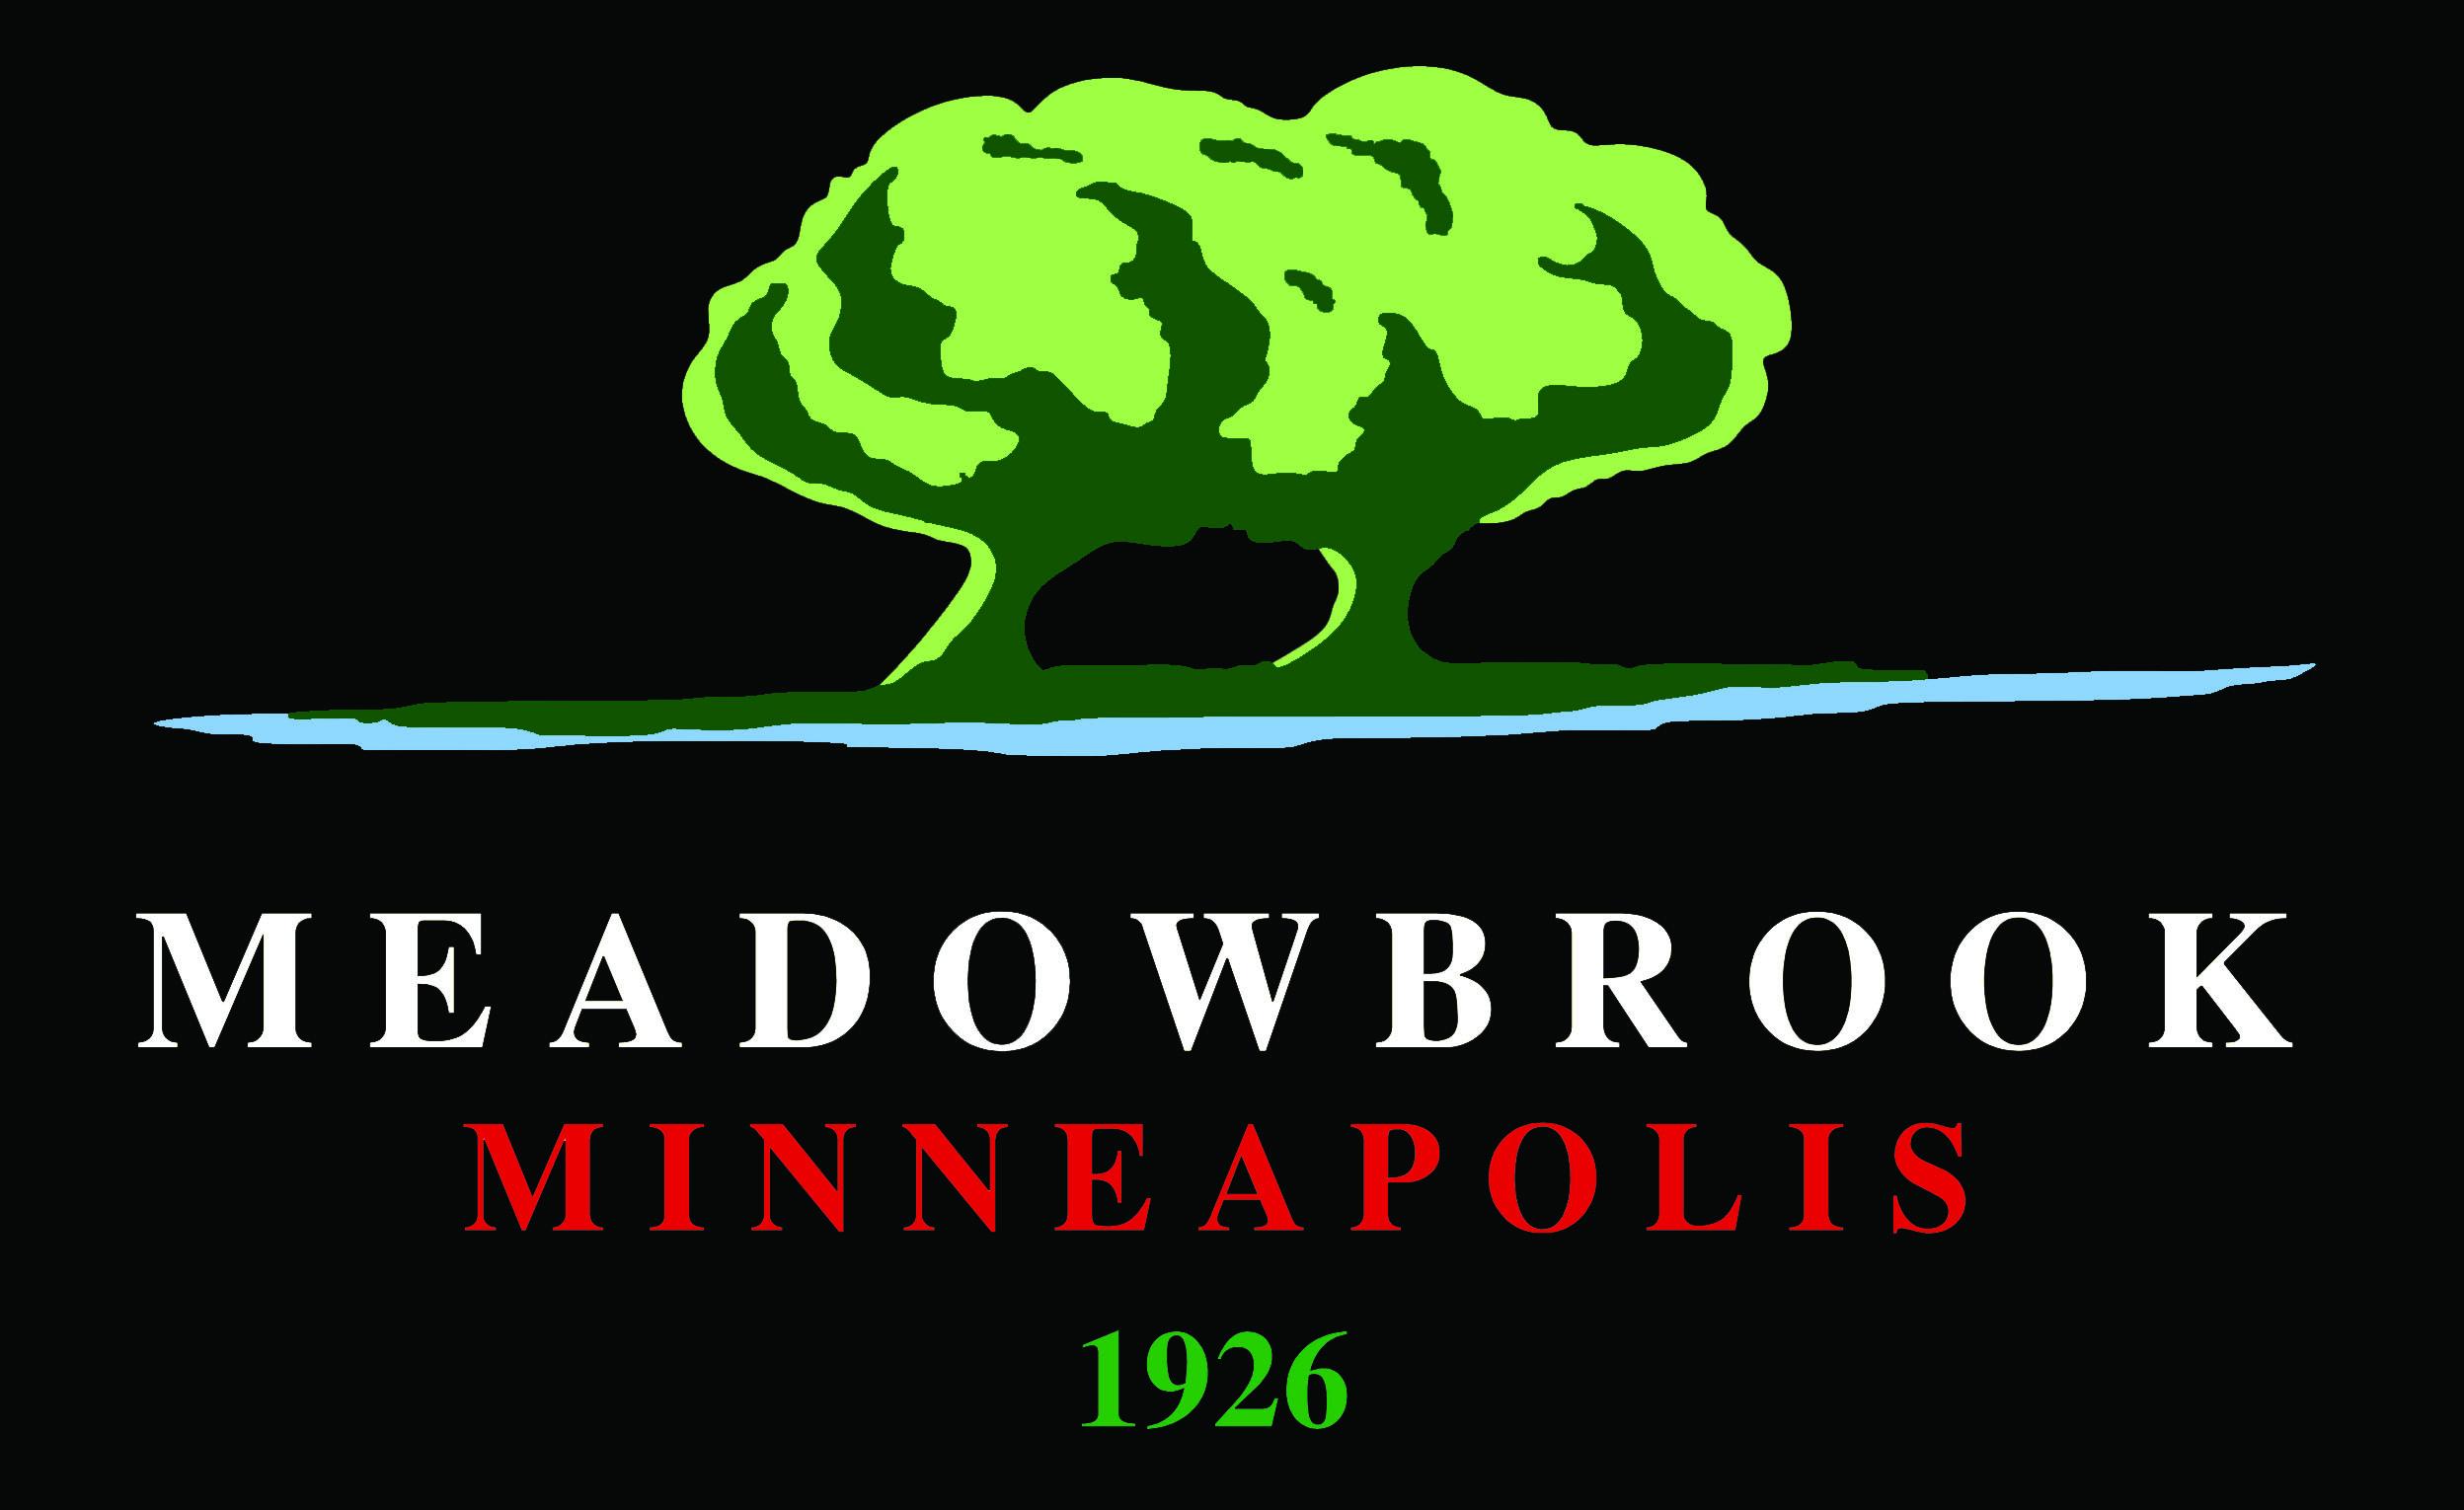 MeadowbrookLogoBlackBgrd.jpg